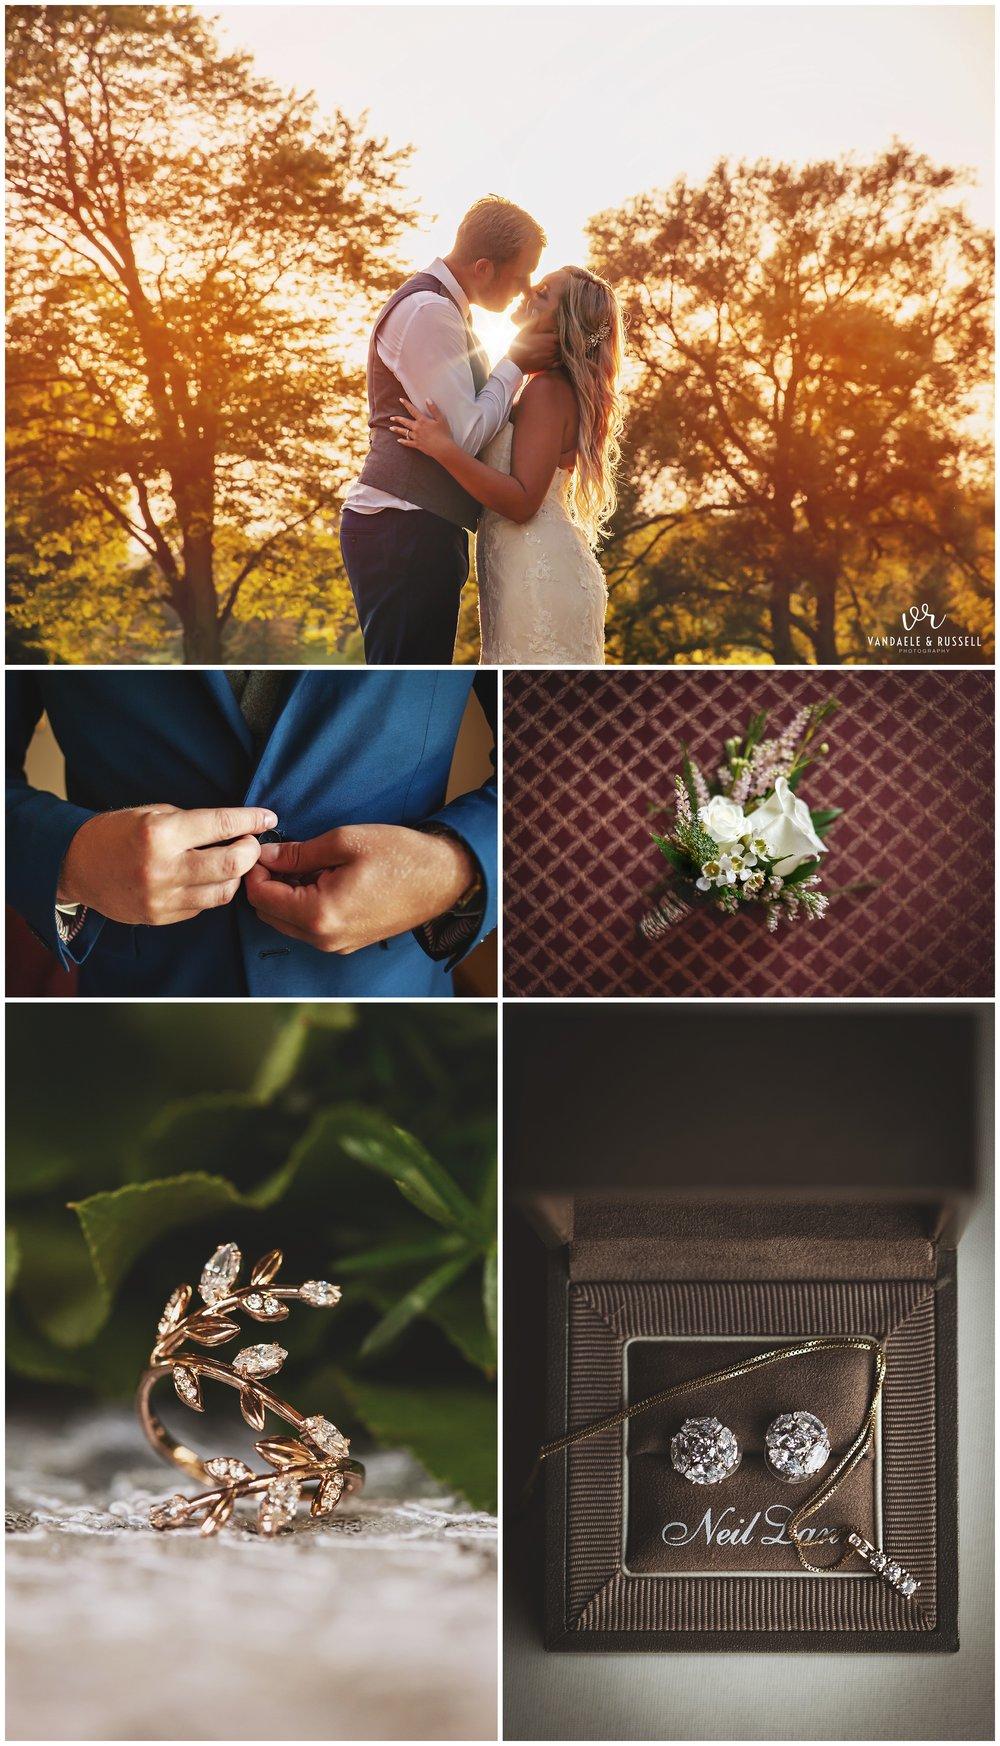 VanDaele-Russell-Wedding-Photography-London-Toronto-Ontario_0142.jpg